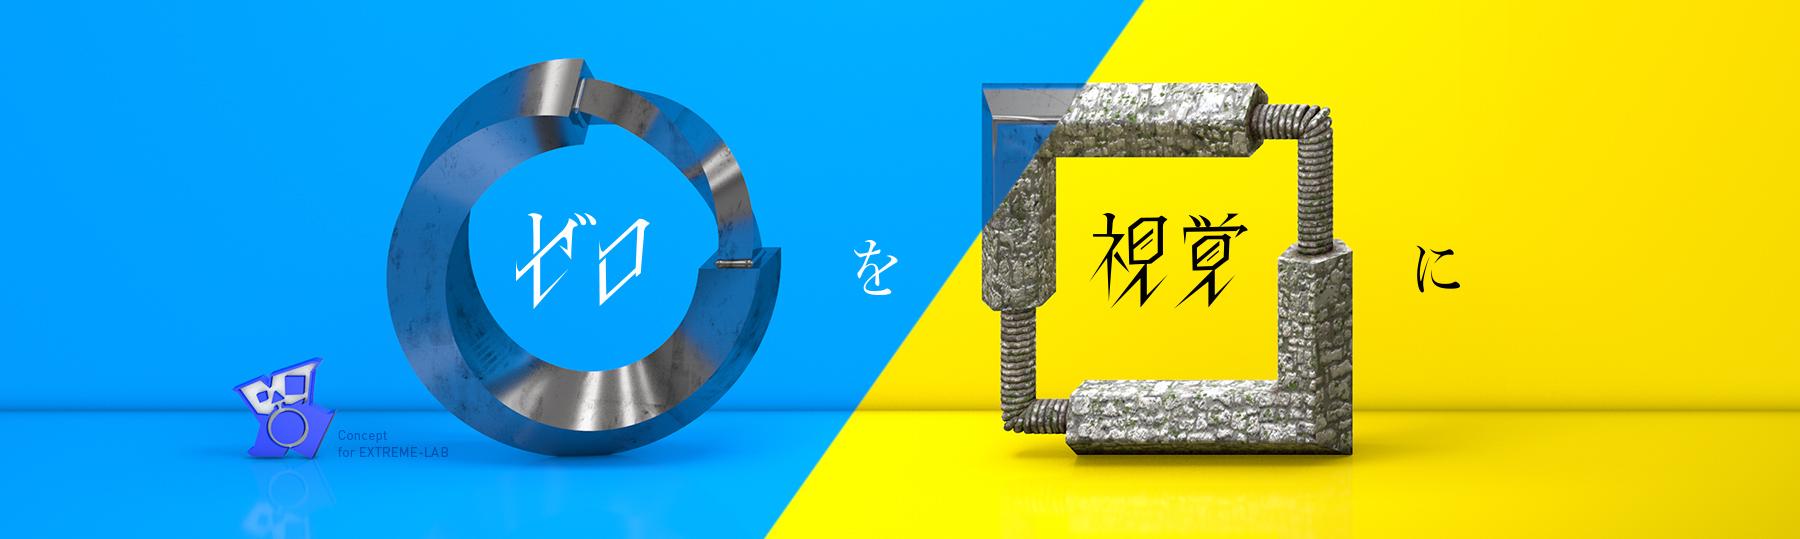 CDジャケットデザイン&CDプレス|エクストリーム・ラボ